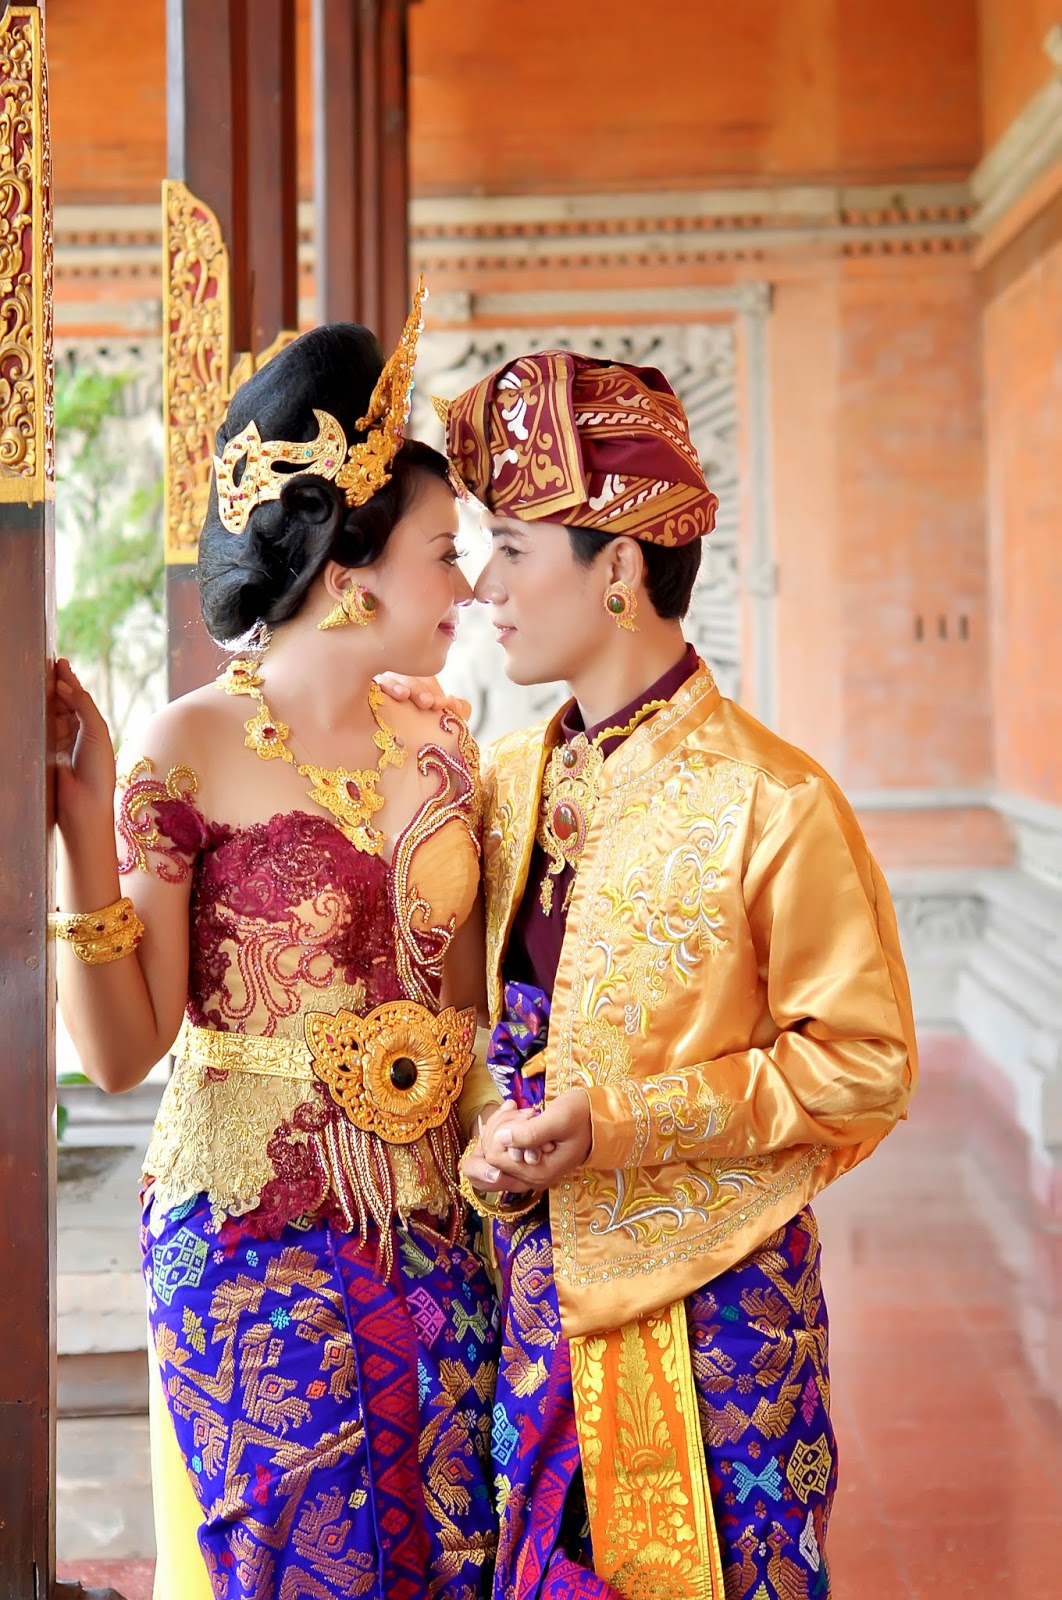 Paket Prewedding Pakian Adat Bali